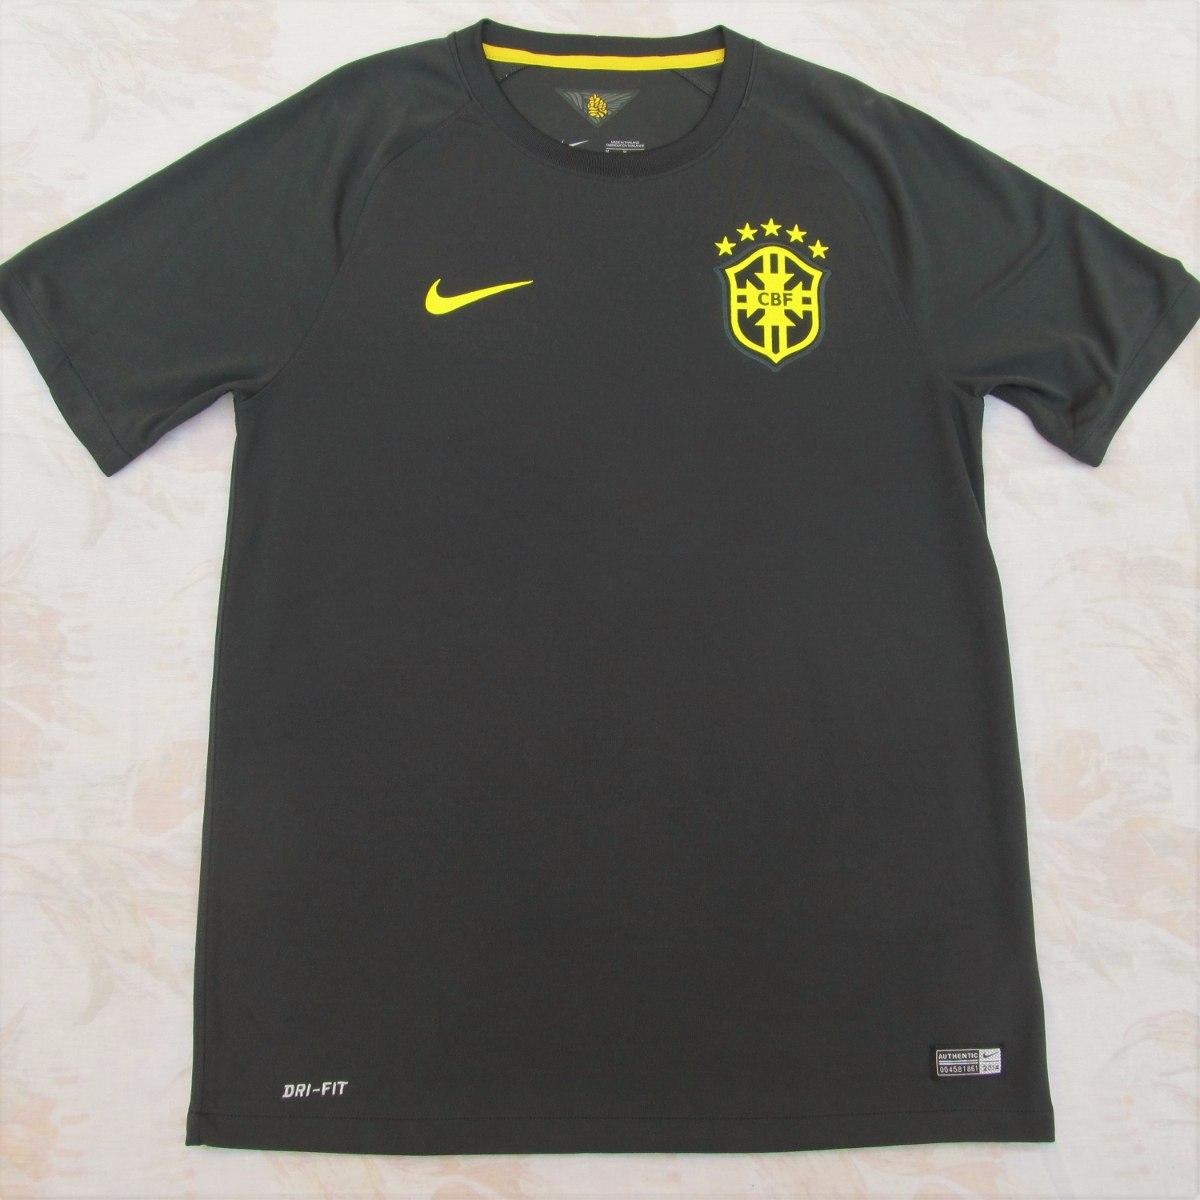 575284-337 camisa nike brasil cbf third 2014 m verde fn1608. Carregando  zoom. b8ed6b0e42867